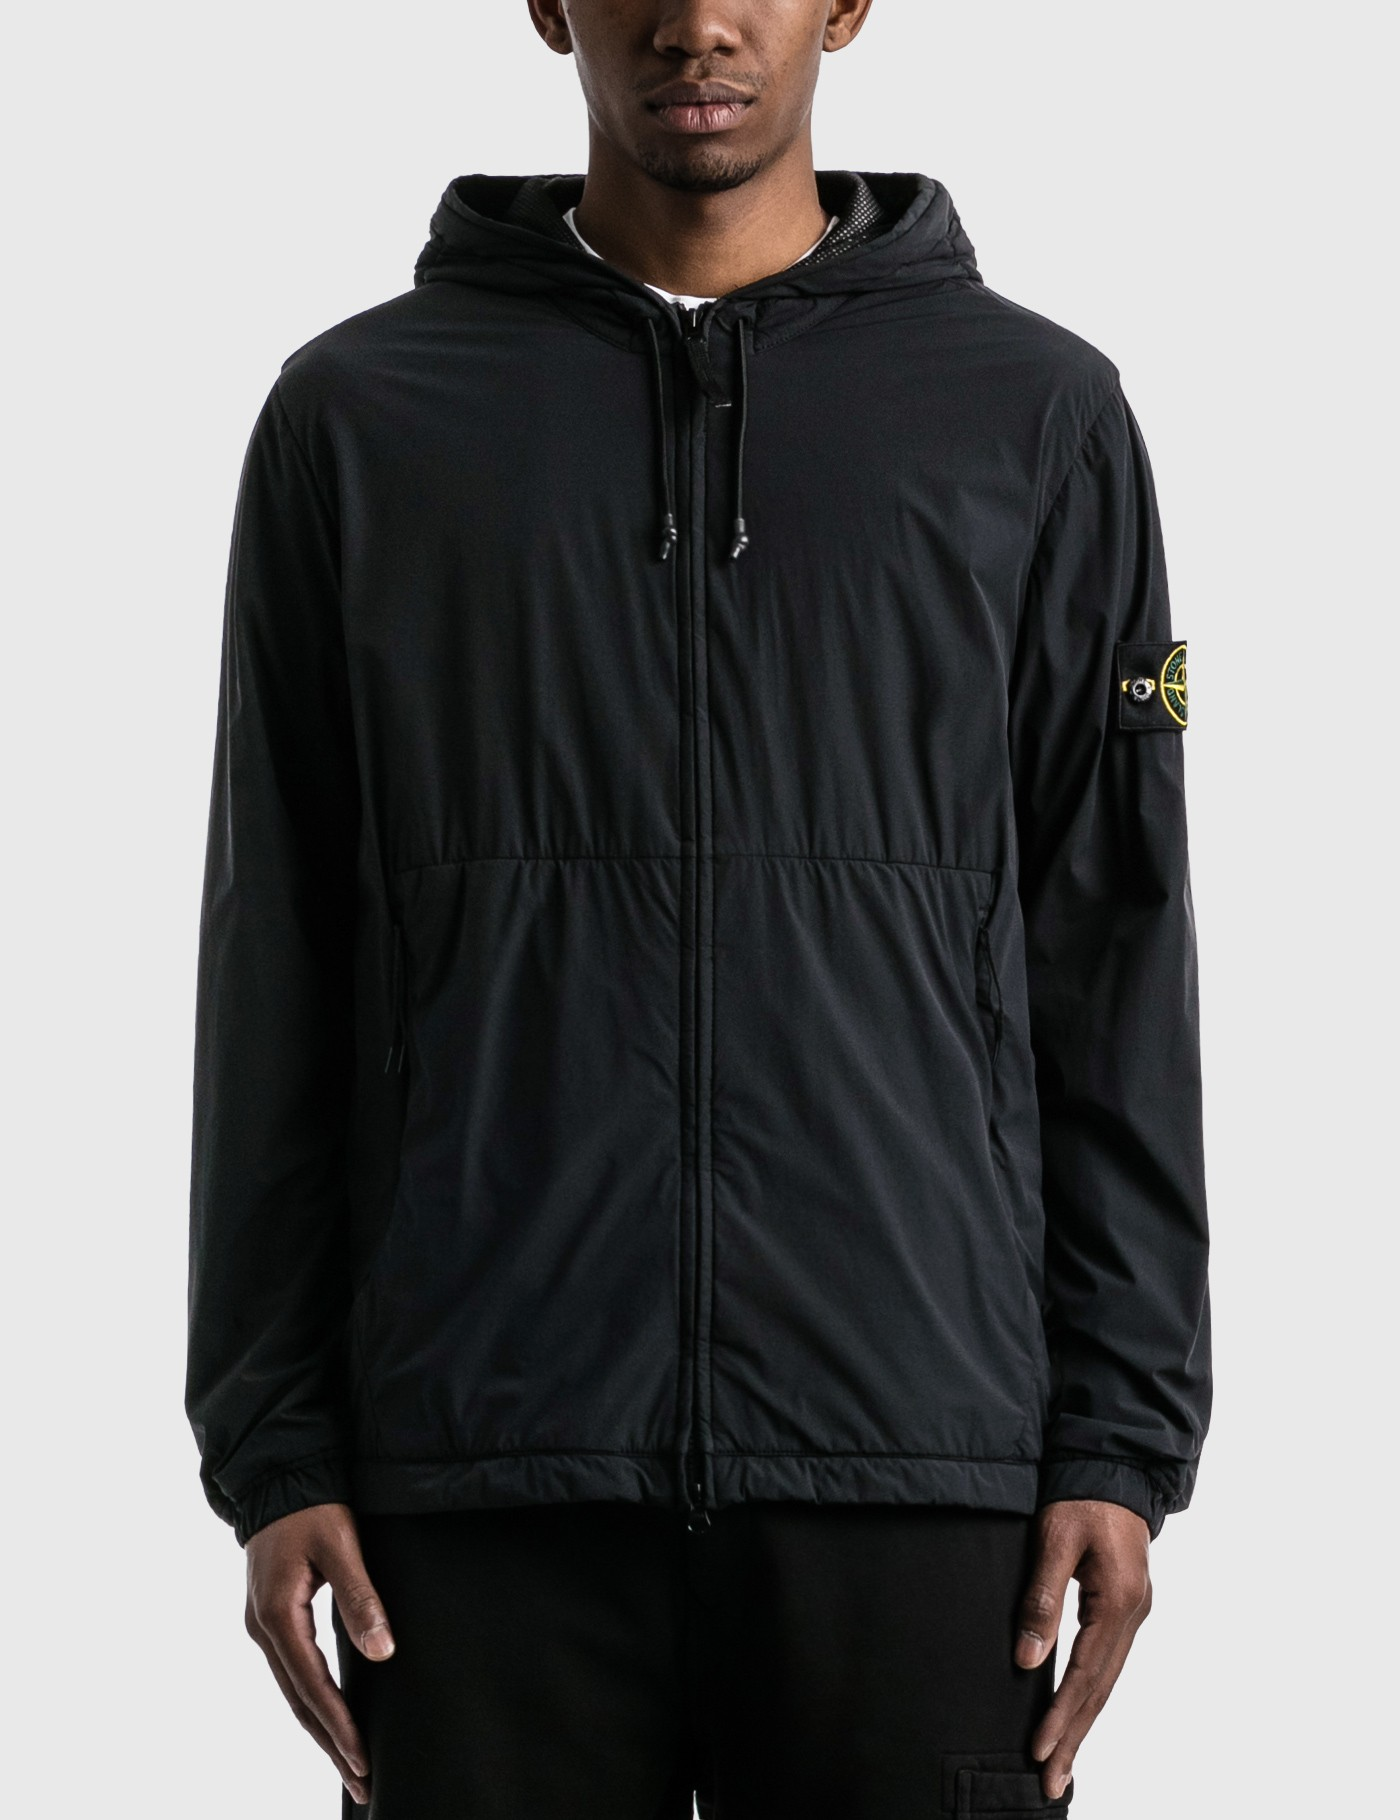 Drawstring Hooded Jacket